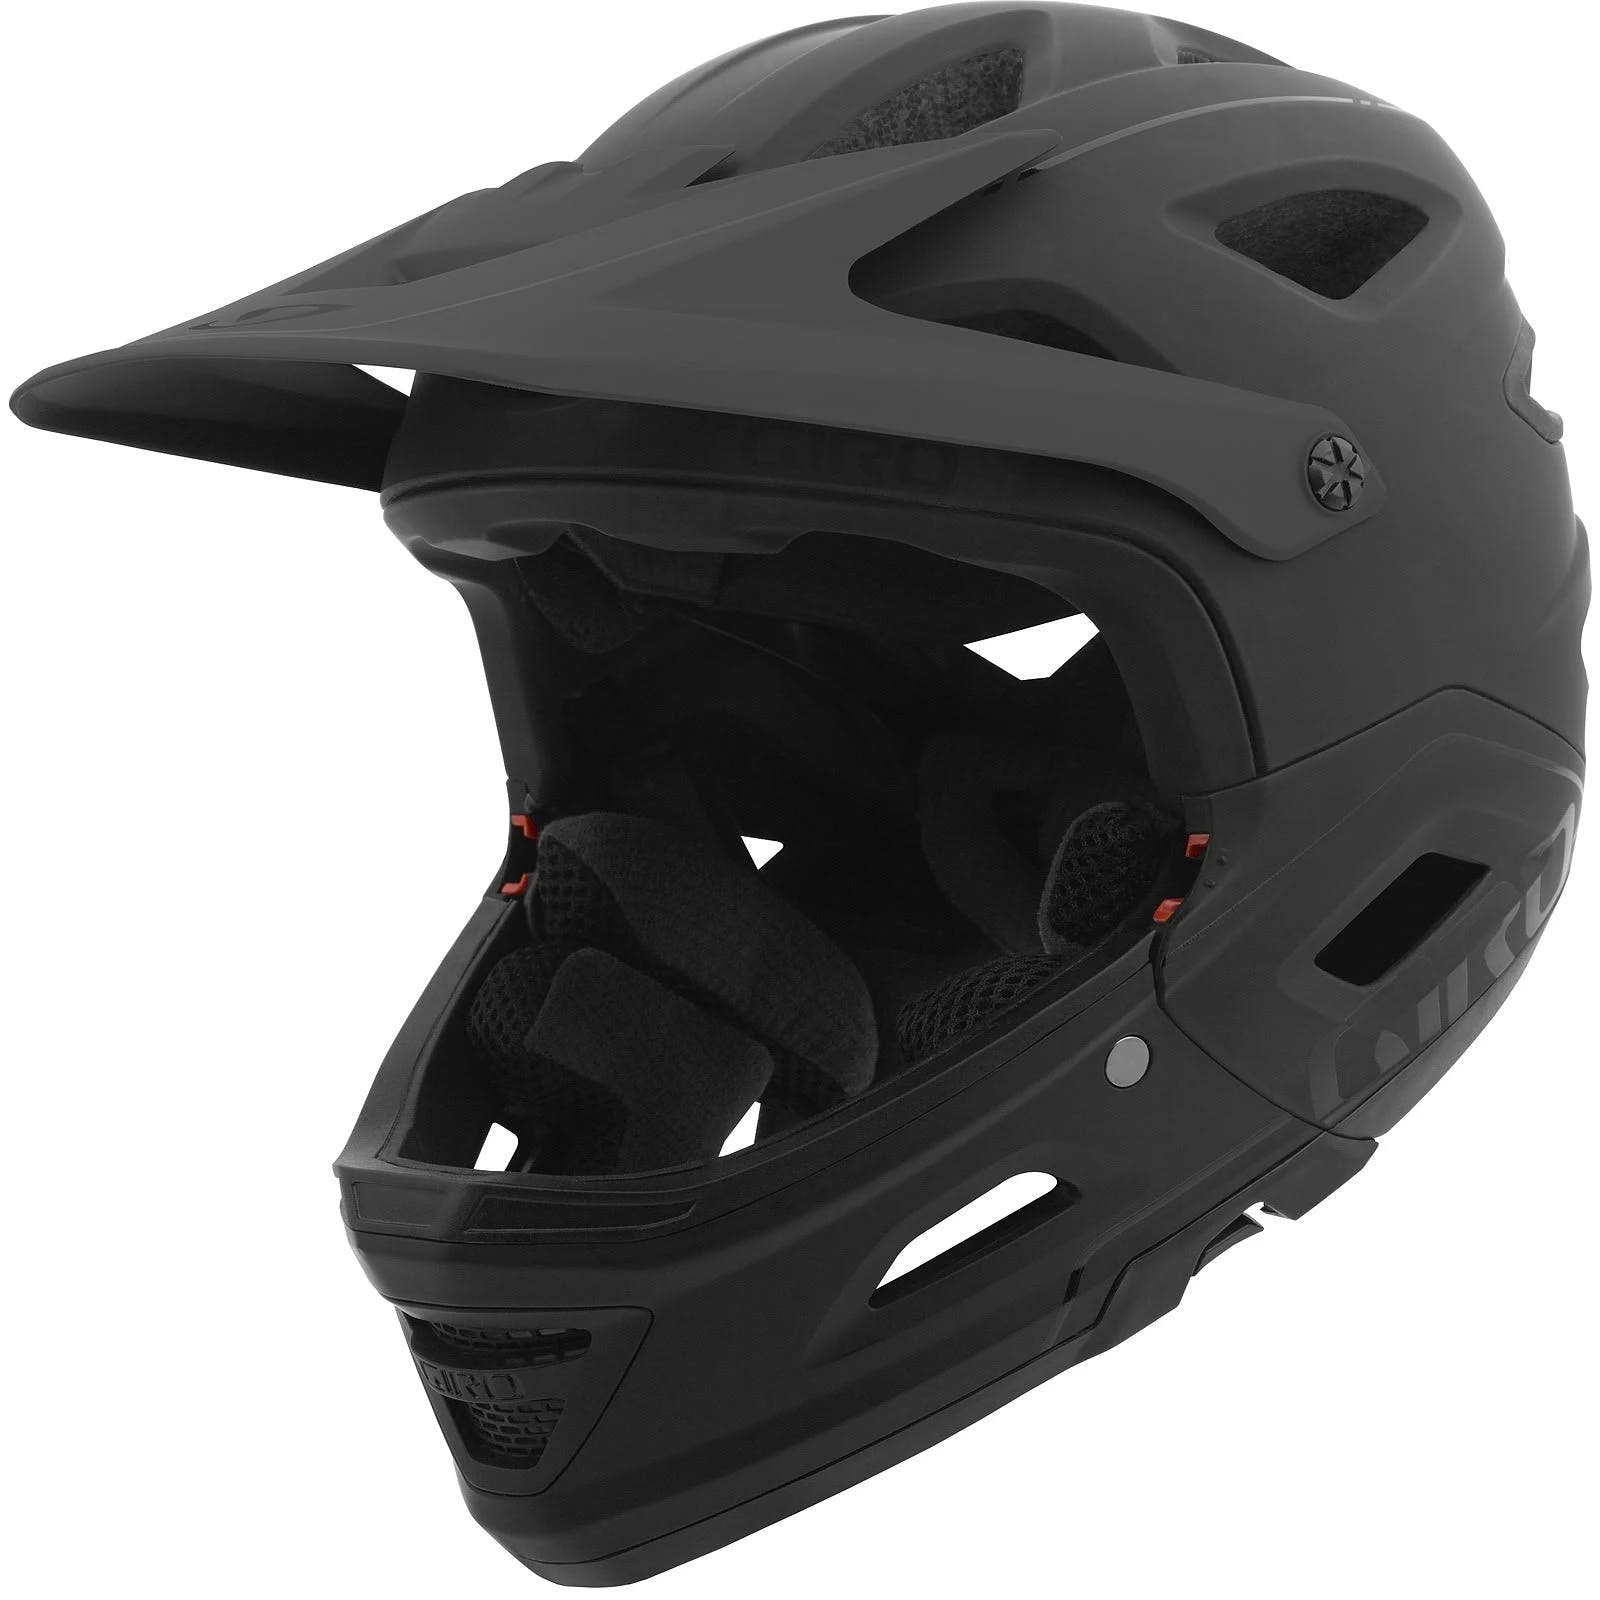 Helmet Giro Switchblade MIPS Matte Black / Gloss Black